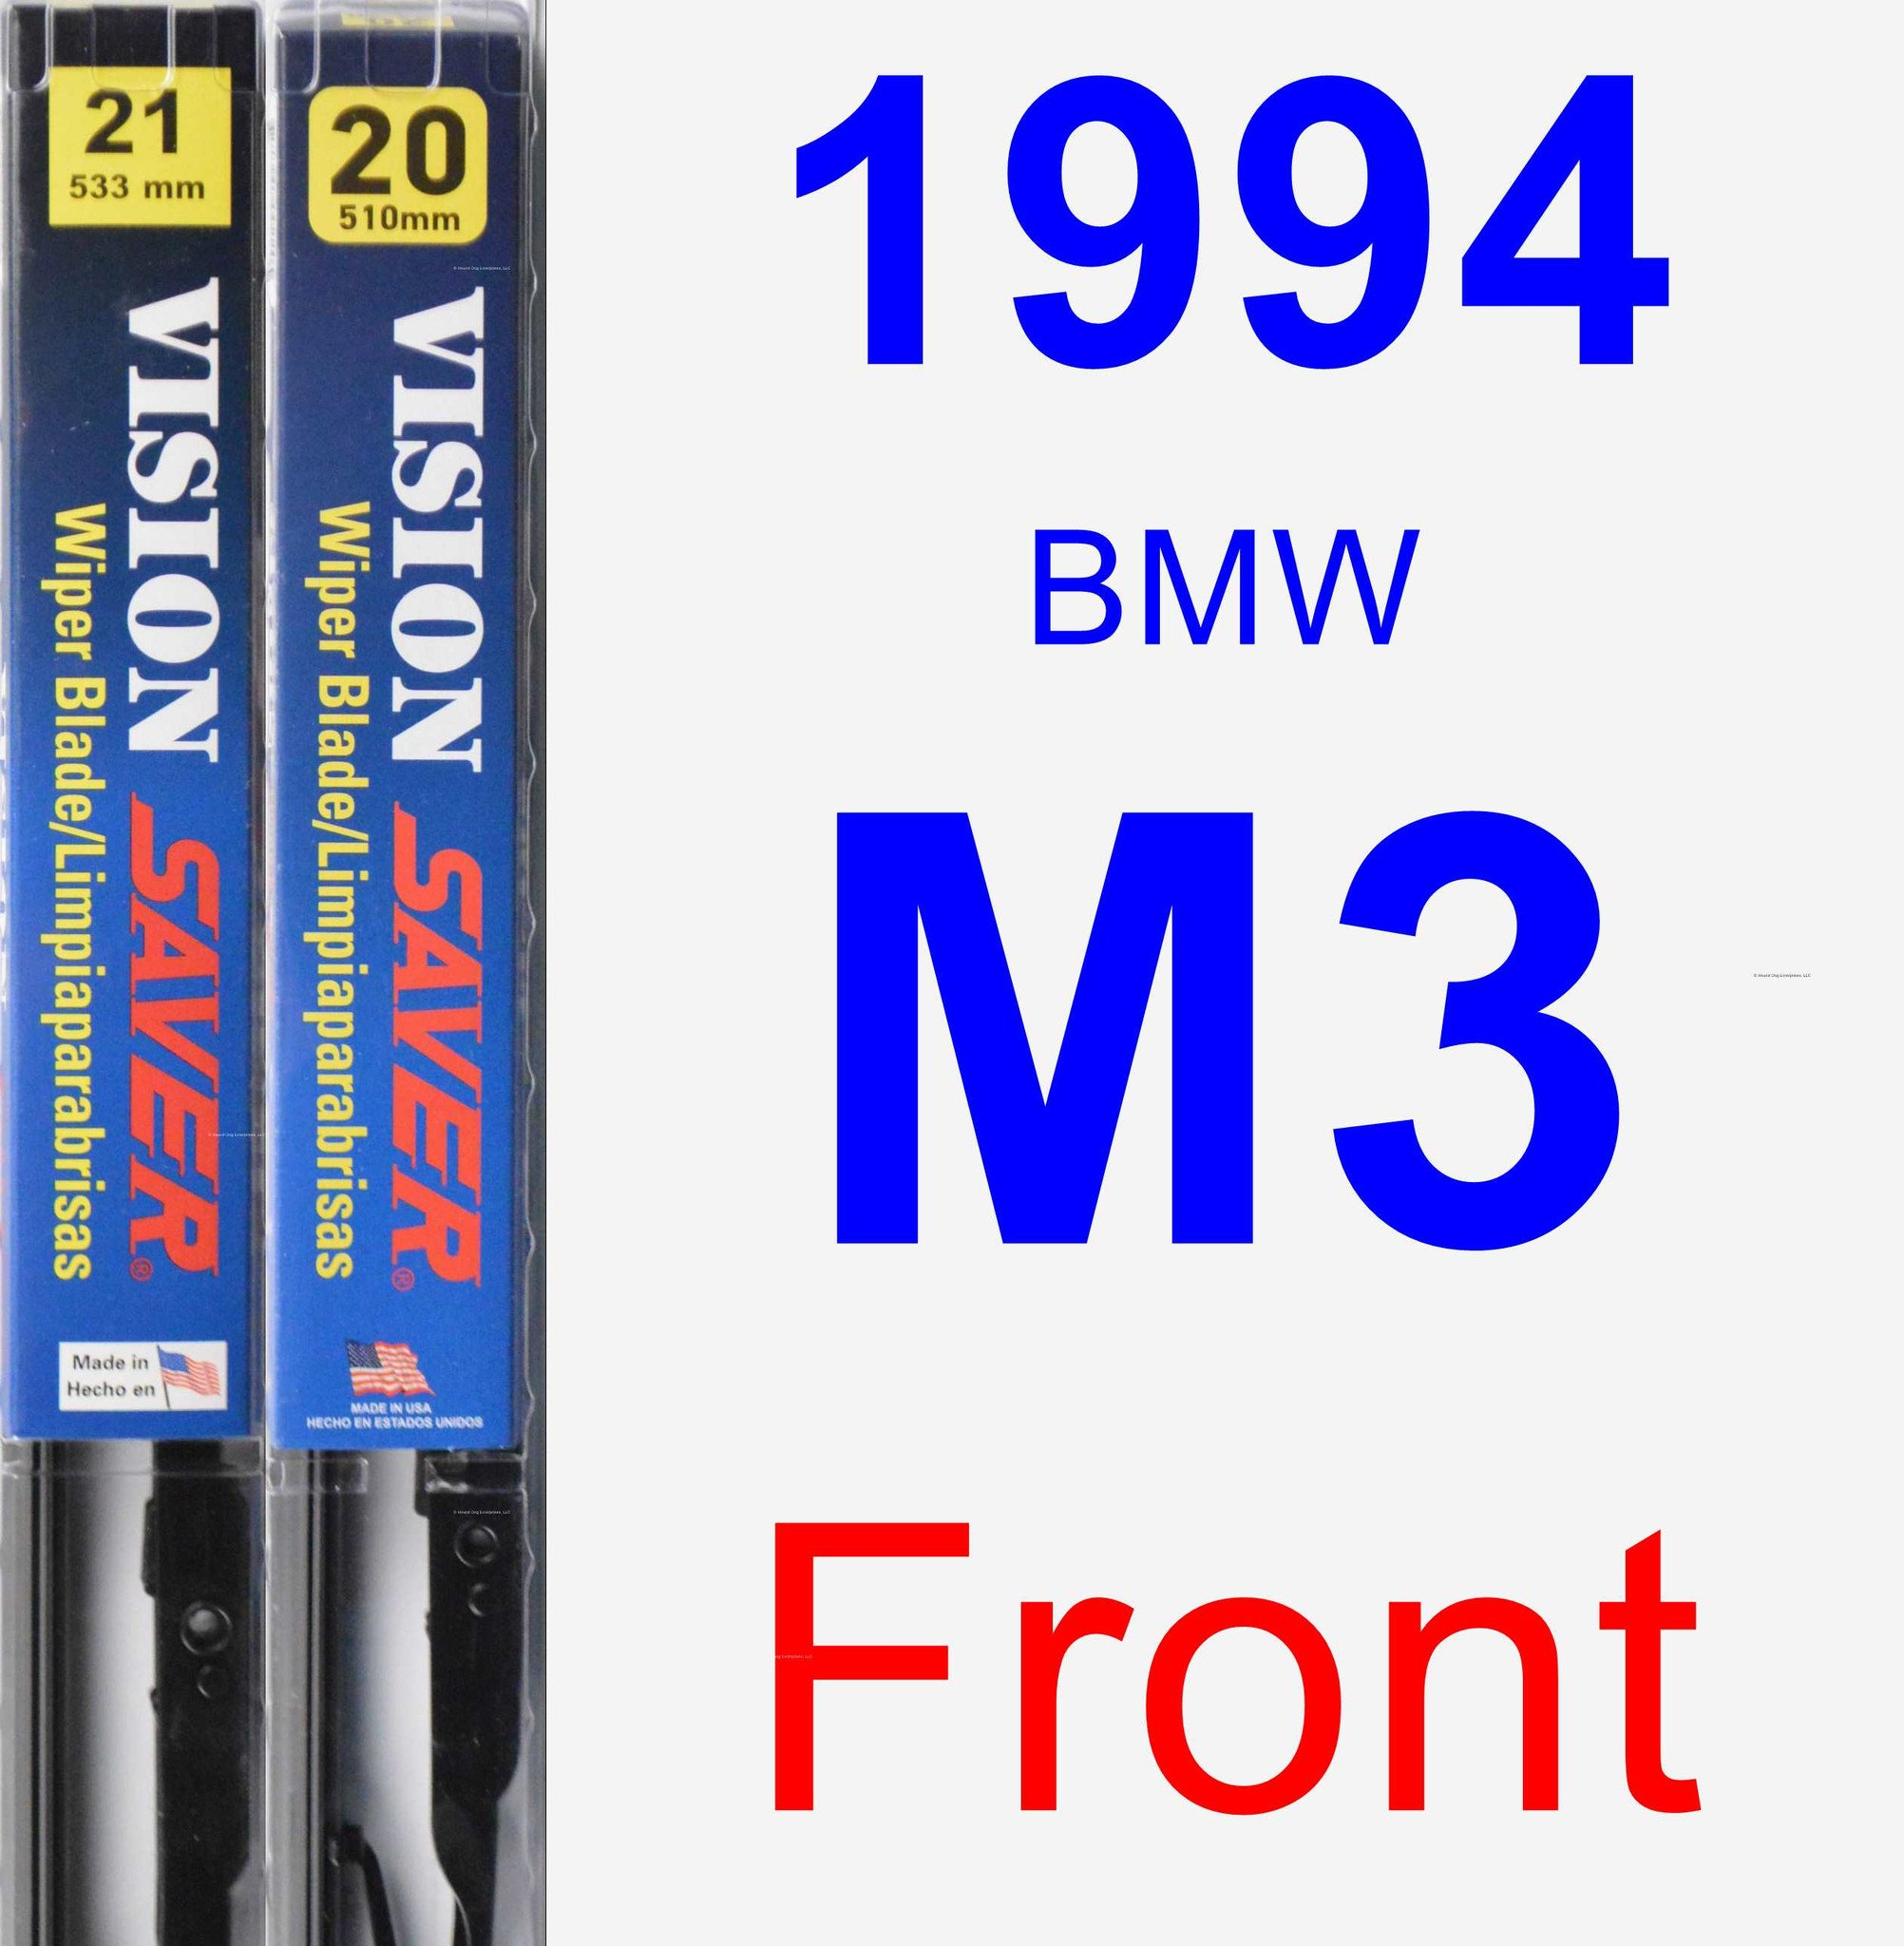 1994 BMW M3 Wiper Blade Set/Kit (Front) (2 Blades) - Vision Saver